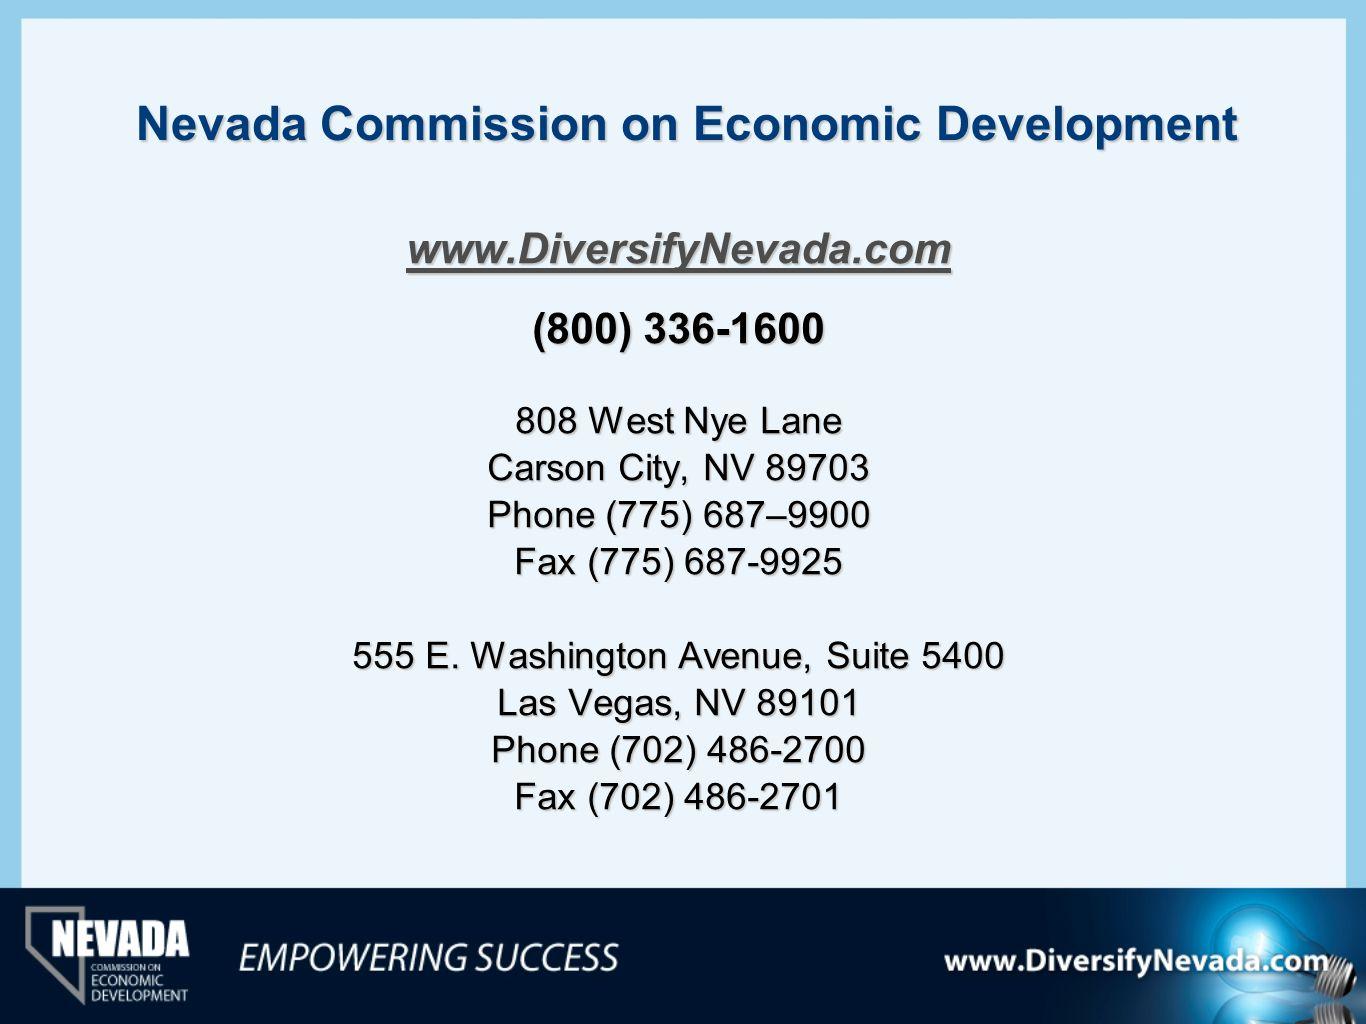 www.DiversifyNevada.com (800) 336-1600 808 West Nye Lane Carson City, NV 89703 Phone (775) 687–9900 Fax (775) 687-9925 555 E. Washington Avenue, Suite